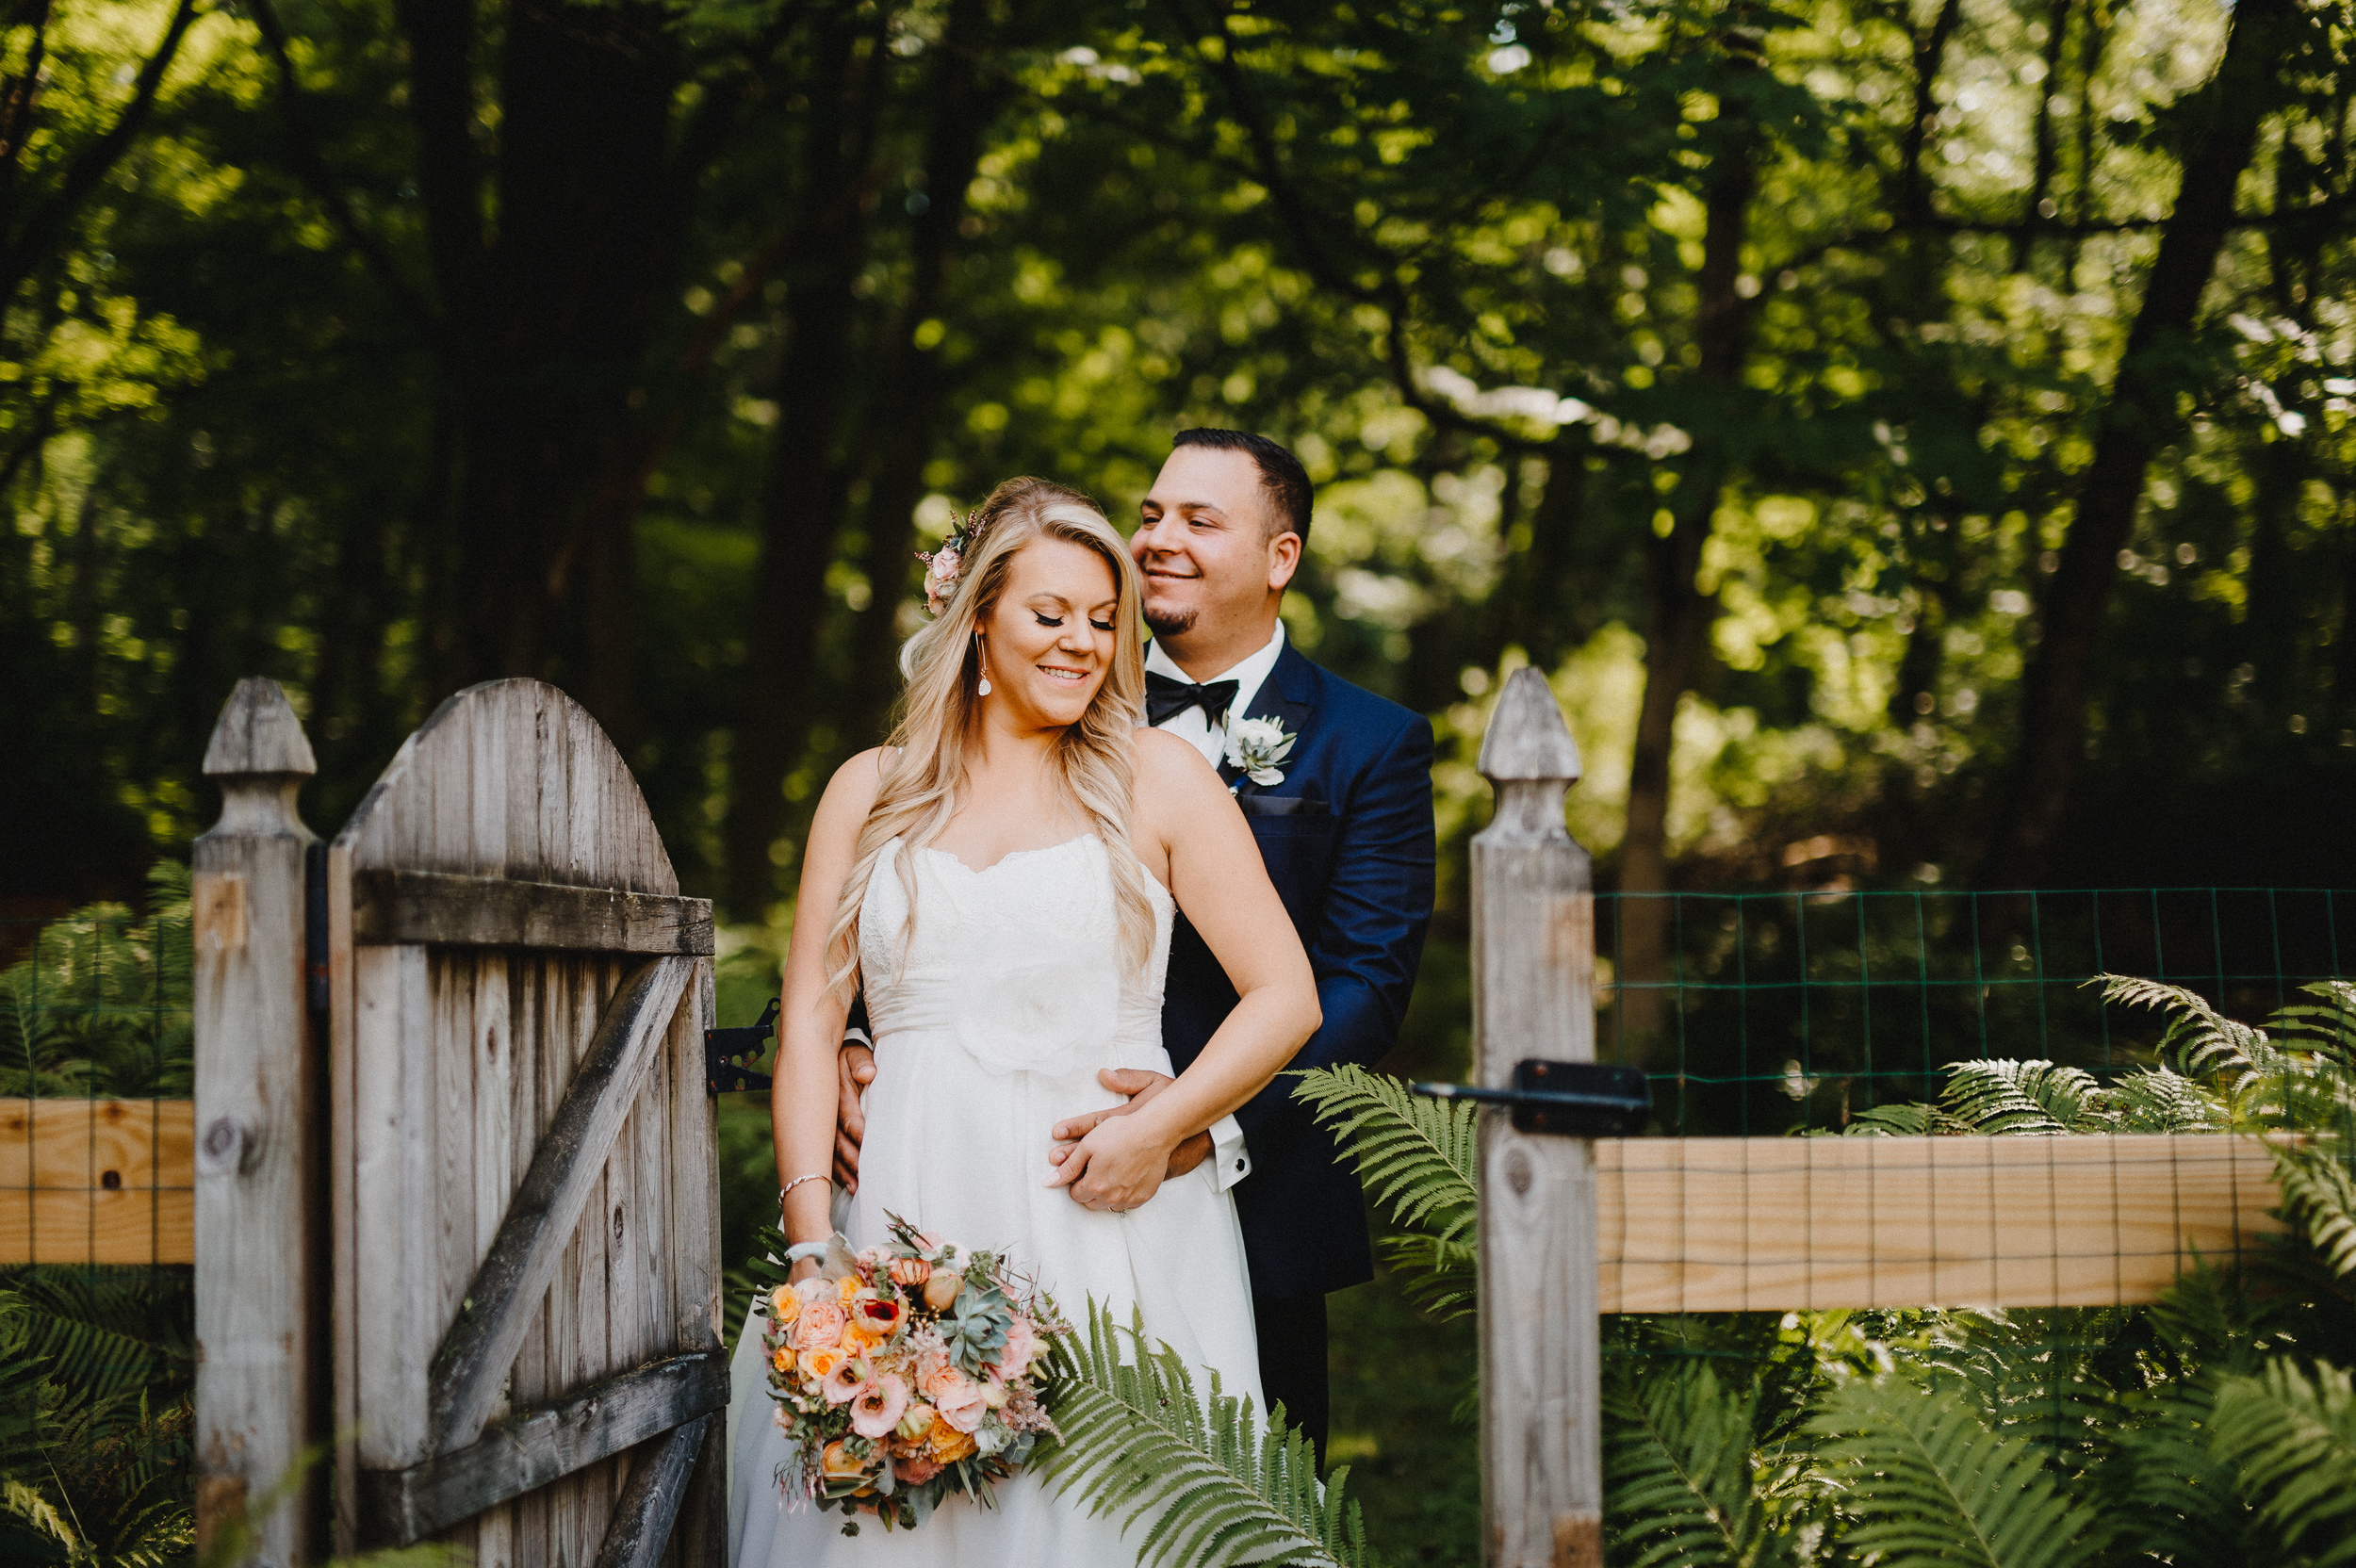 holly-hedge-estate-wedding-photographer-pat-robinson-photography-37.jpg